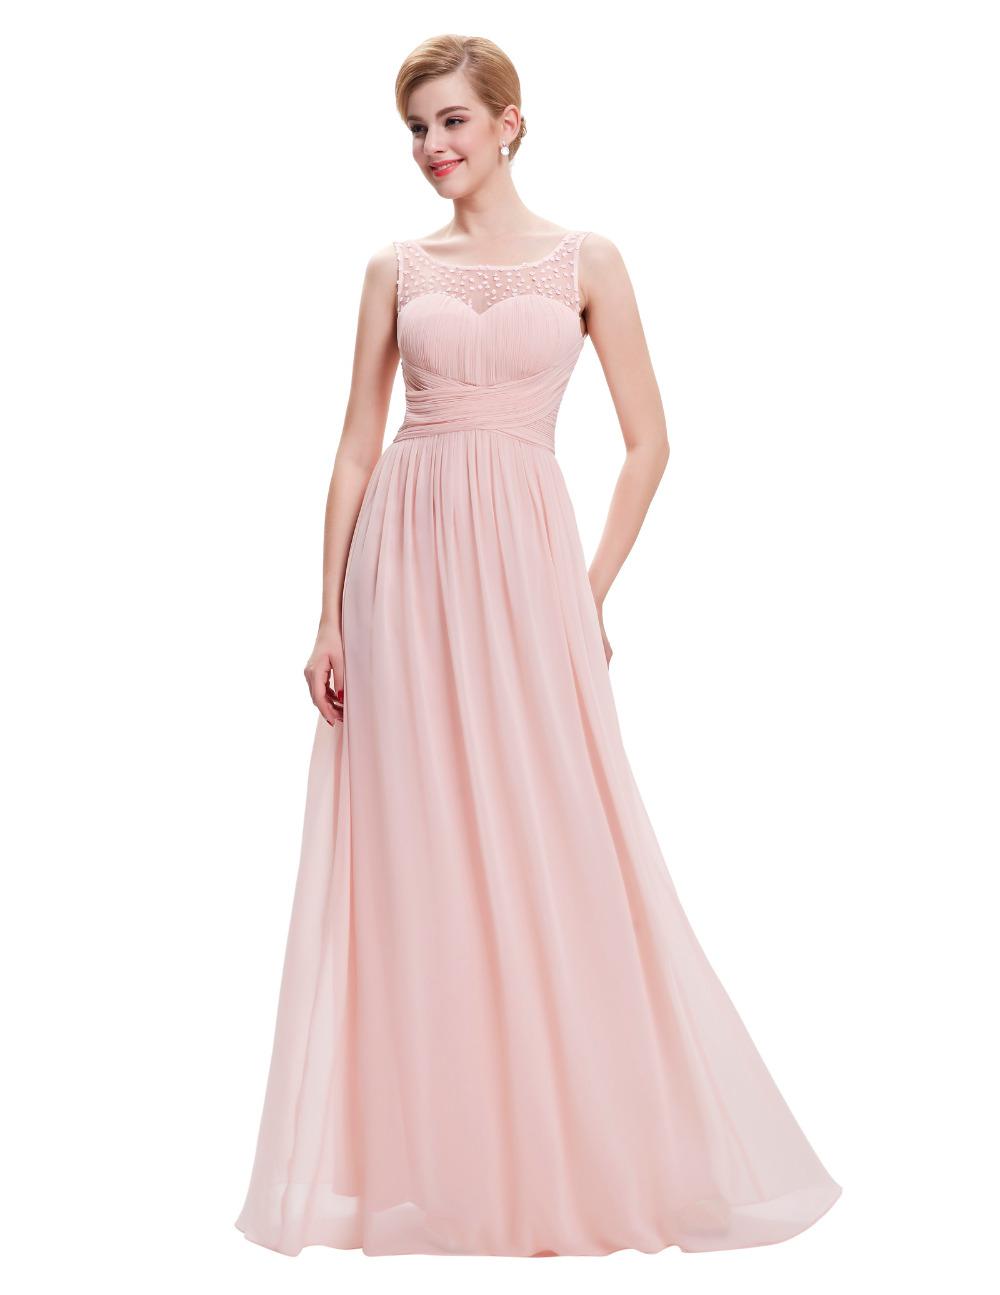 Cheap-long pale pink bridesmaid dresses